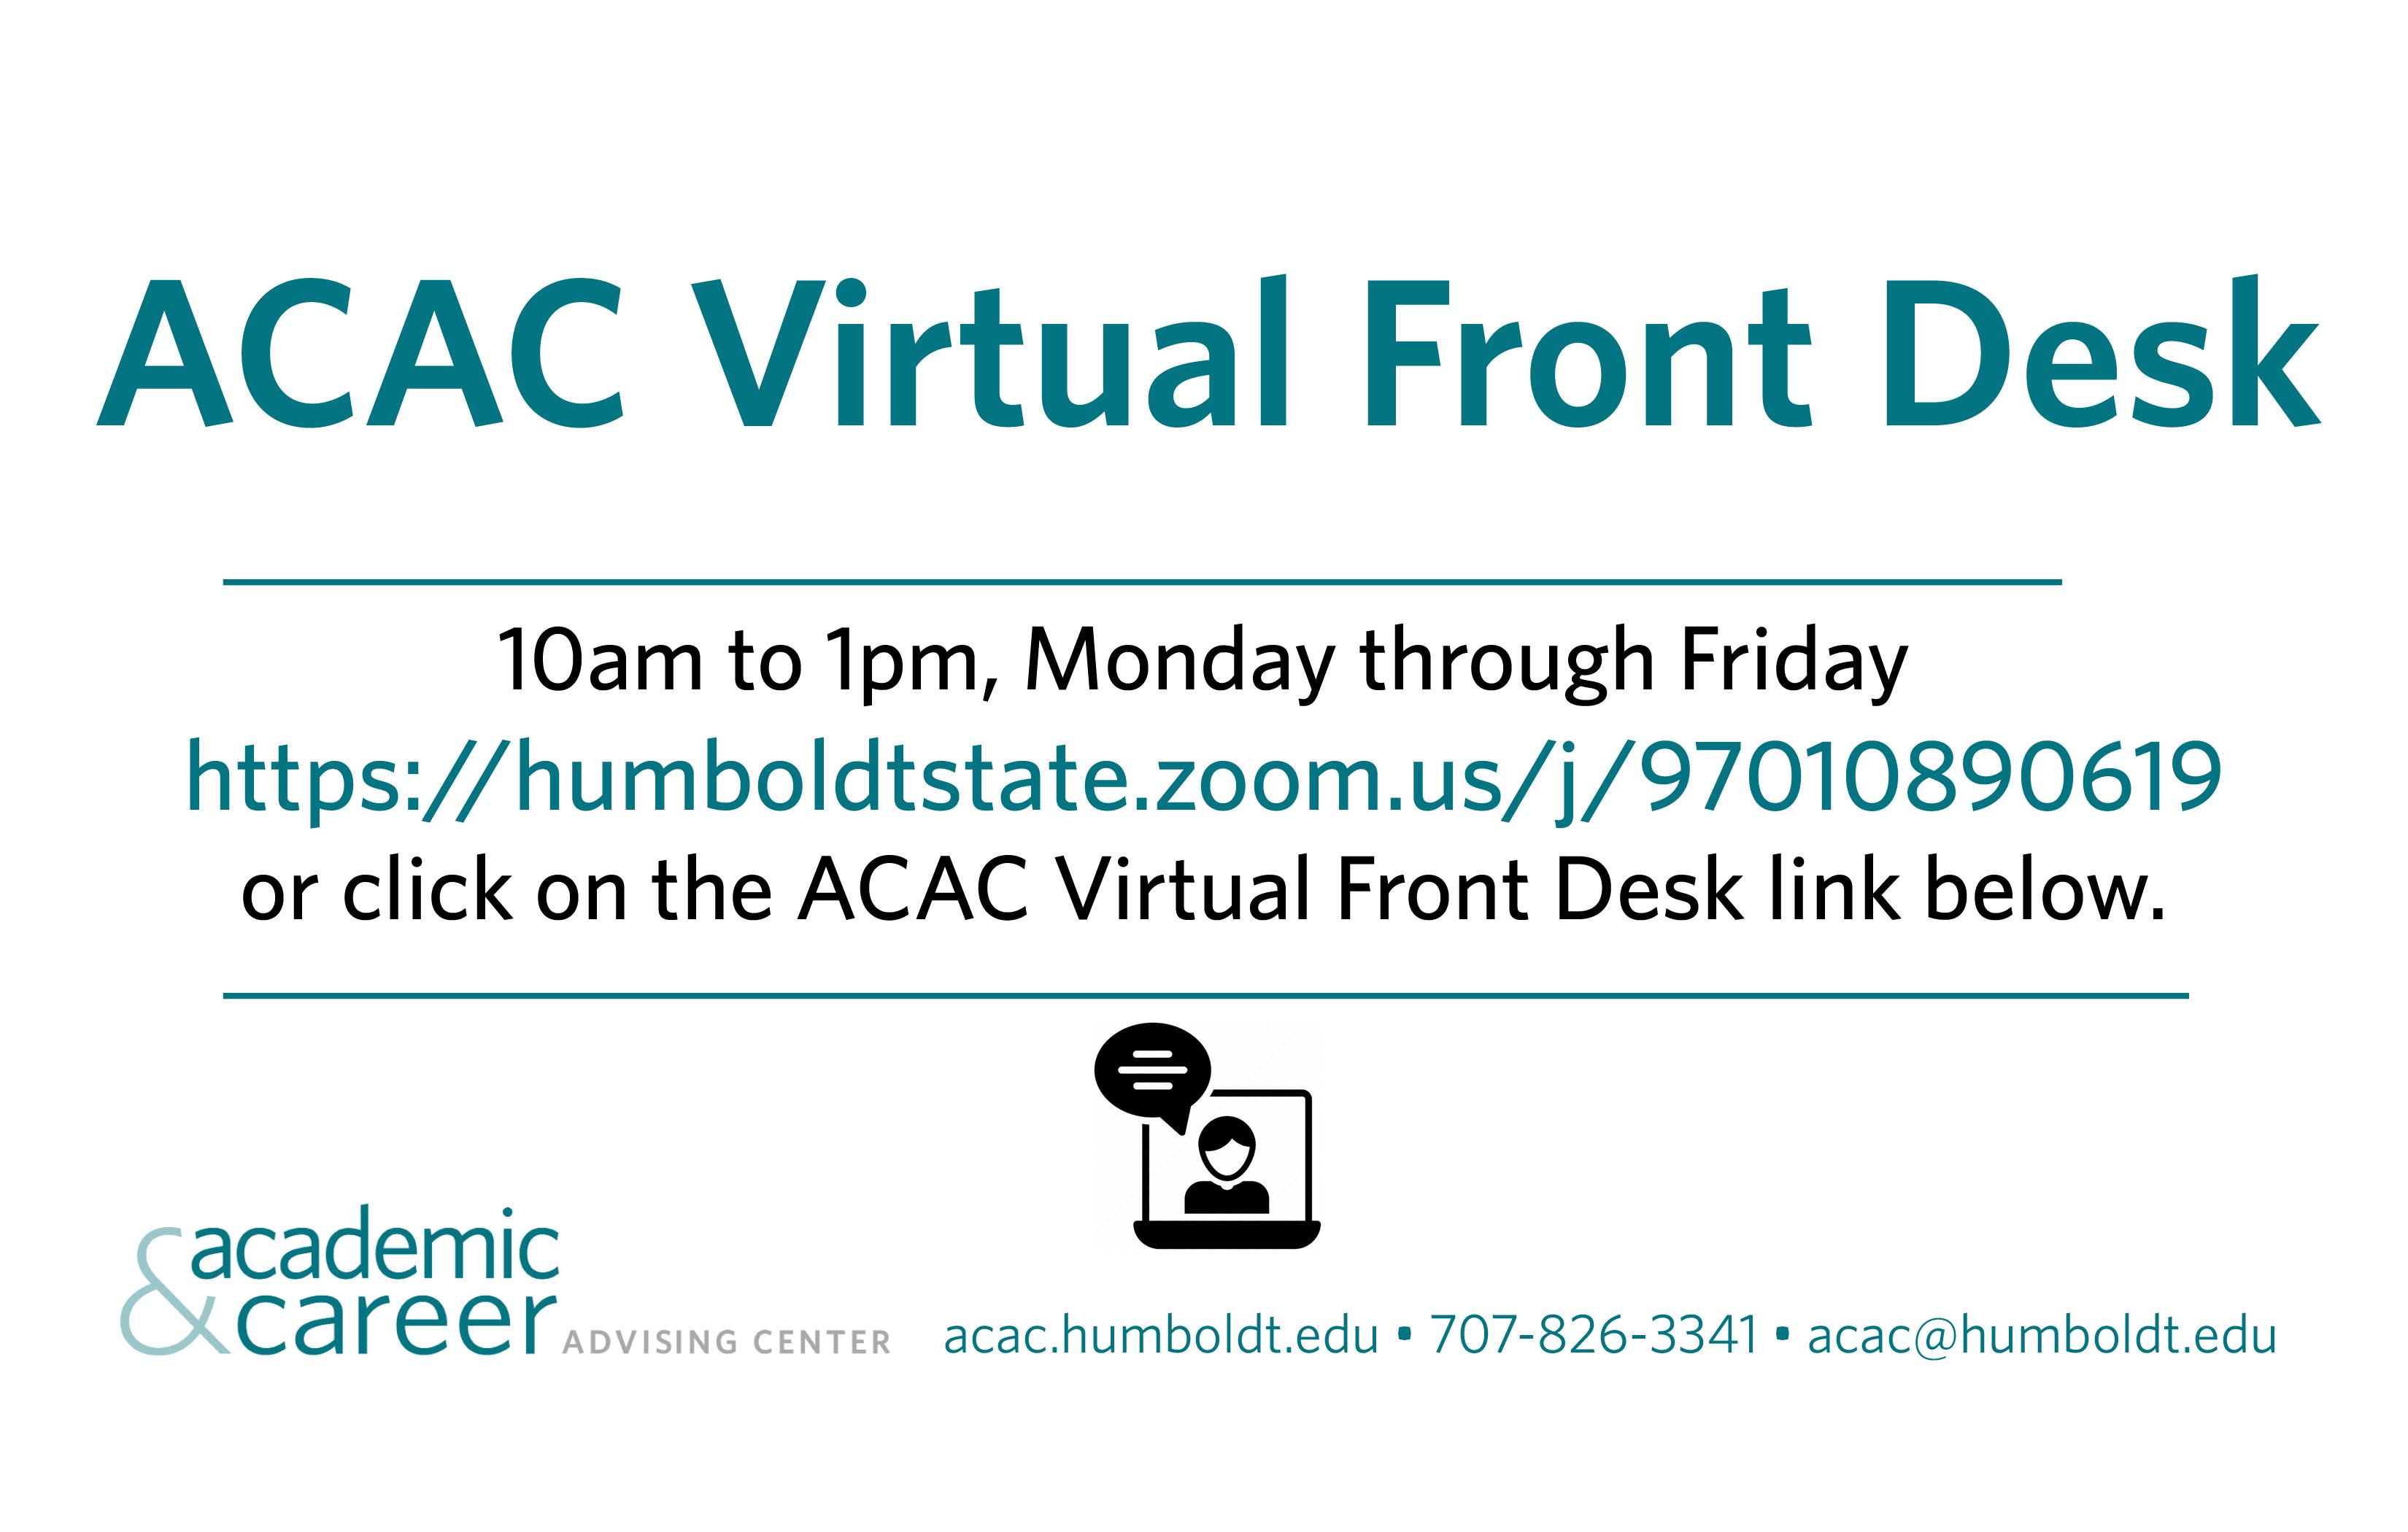 virtual front desk zoom humboldtstate.zoom.us/j/97010890619